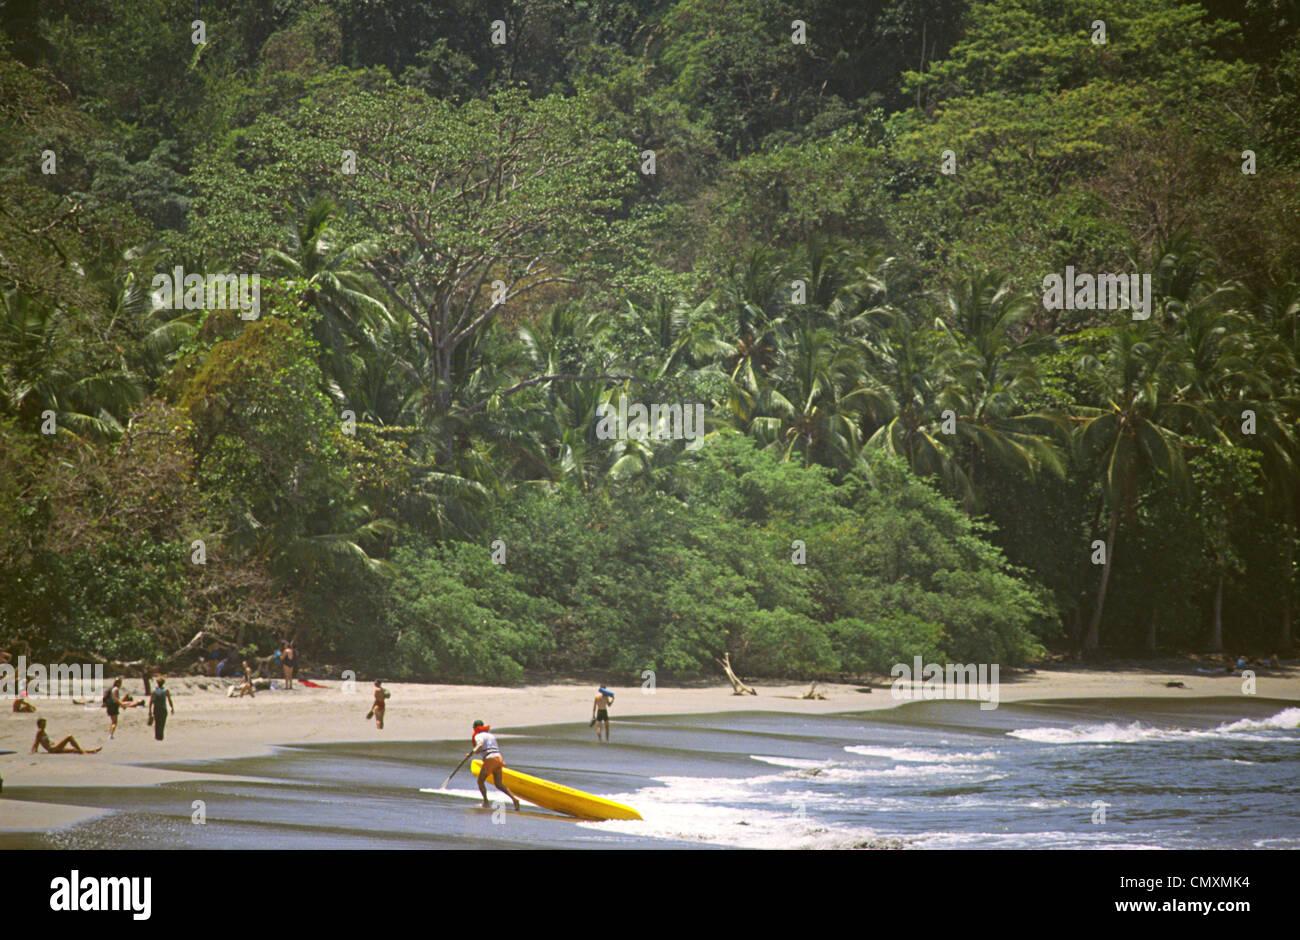 Savage beach, Maunel Antonio Nationalpark, Costa Rica - Stock Image